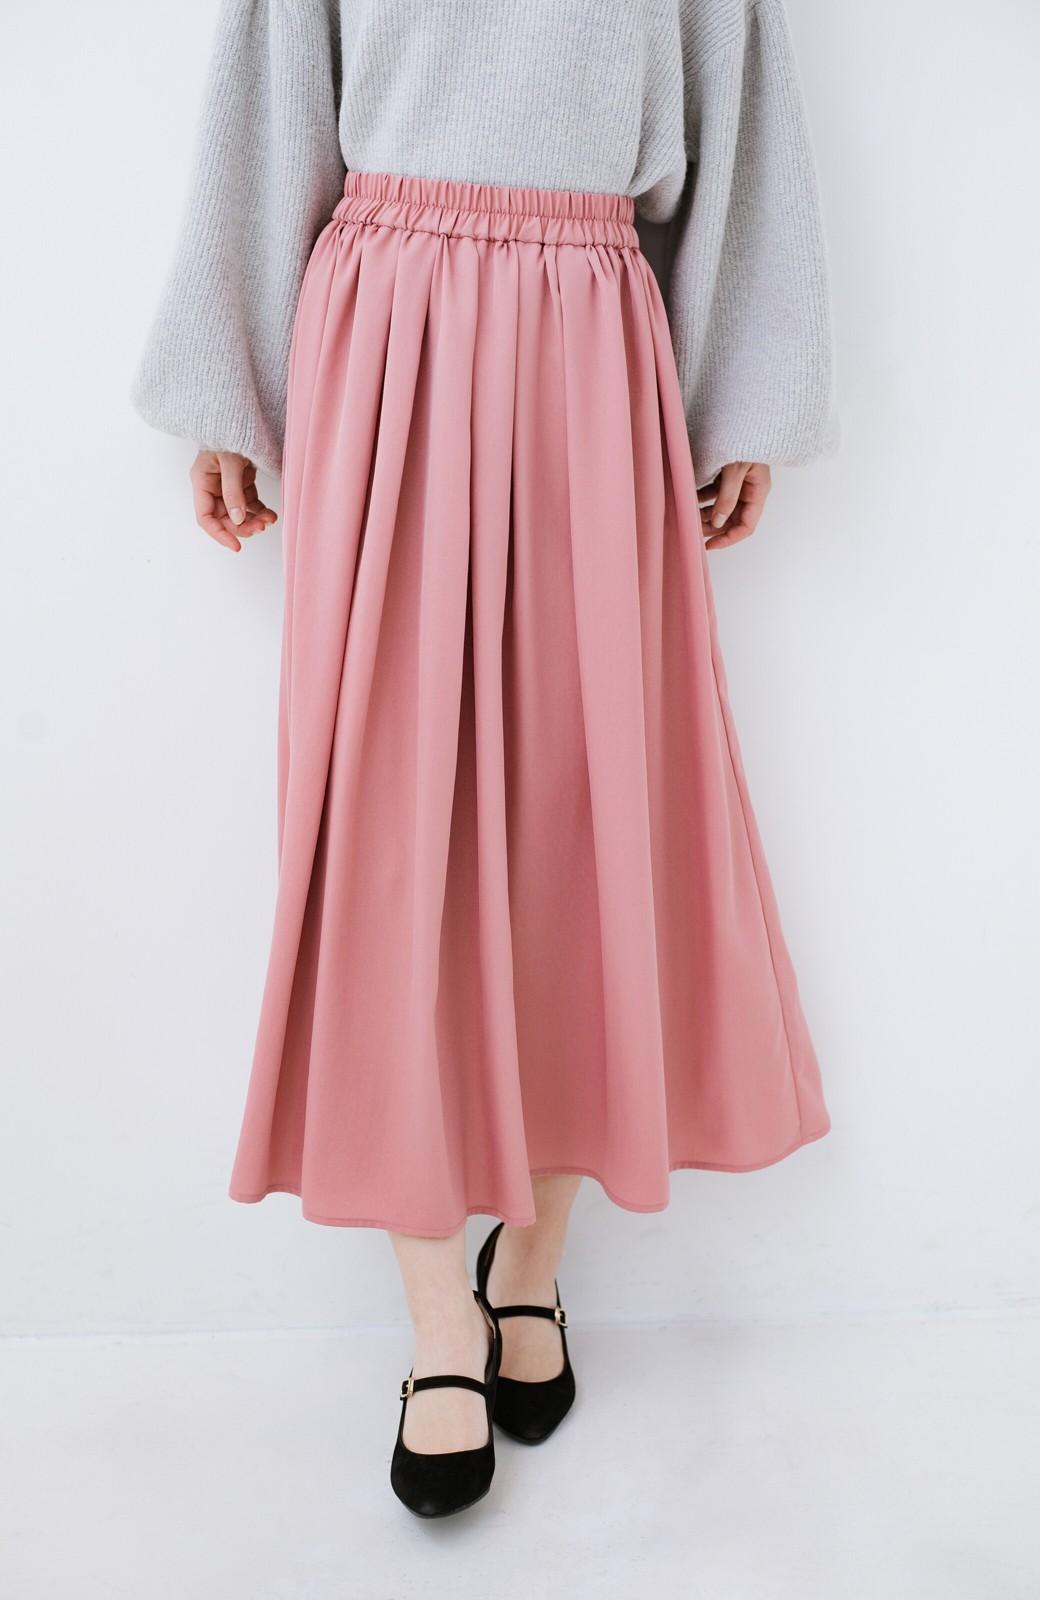 haco! きれいなお姉さんになれる気がするミモレ丈フレアースカート <ピンク>の商品写真1